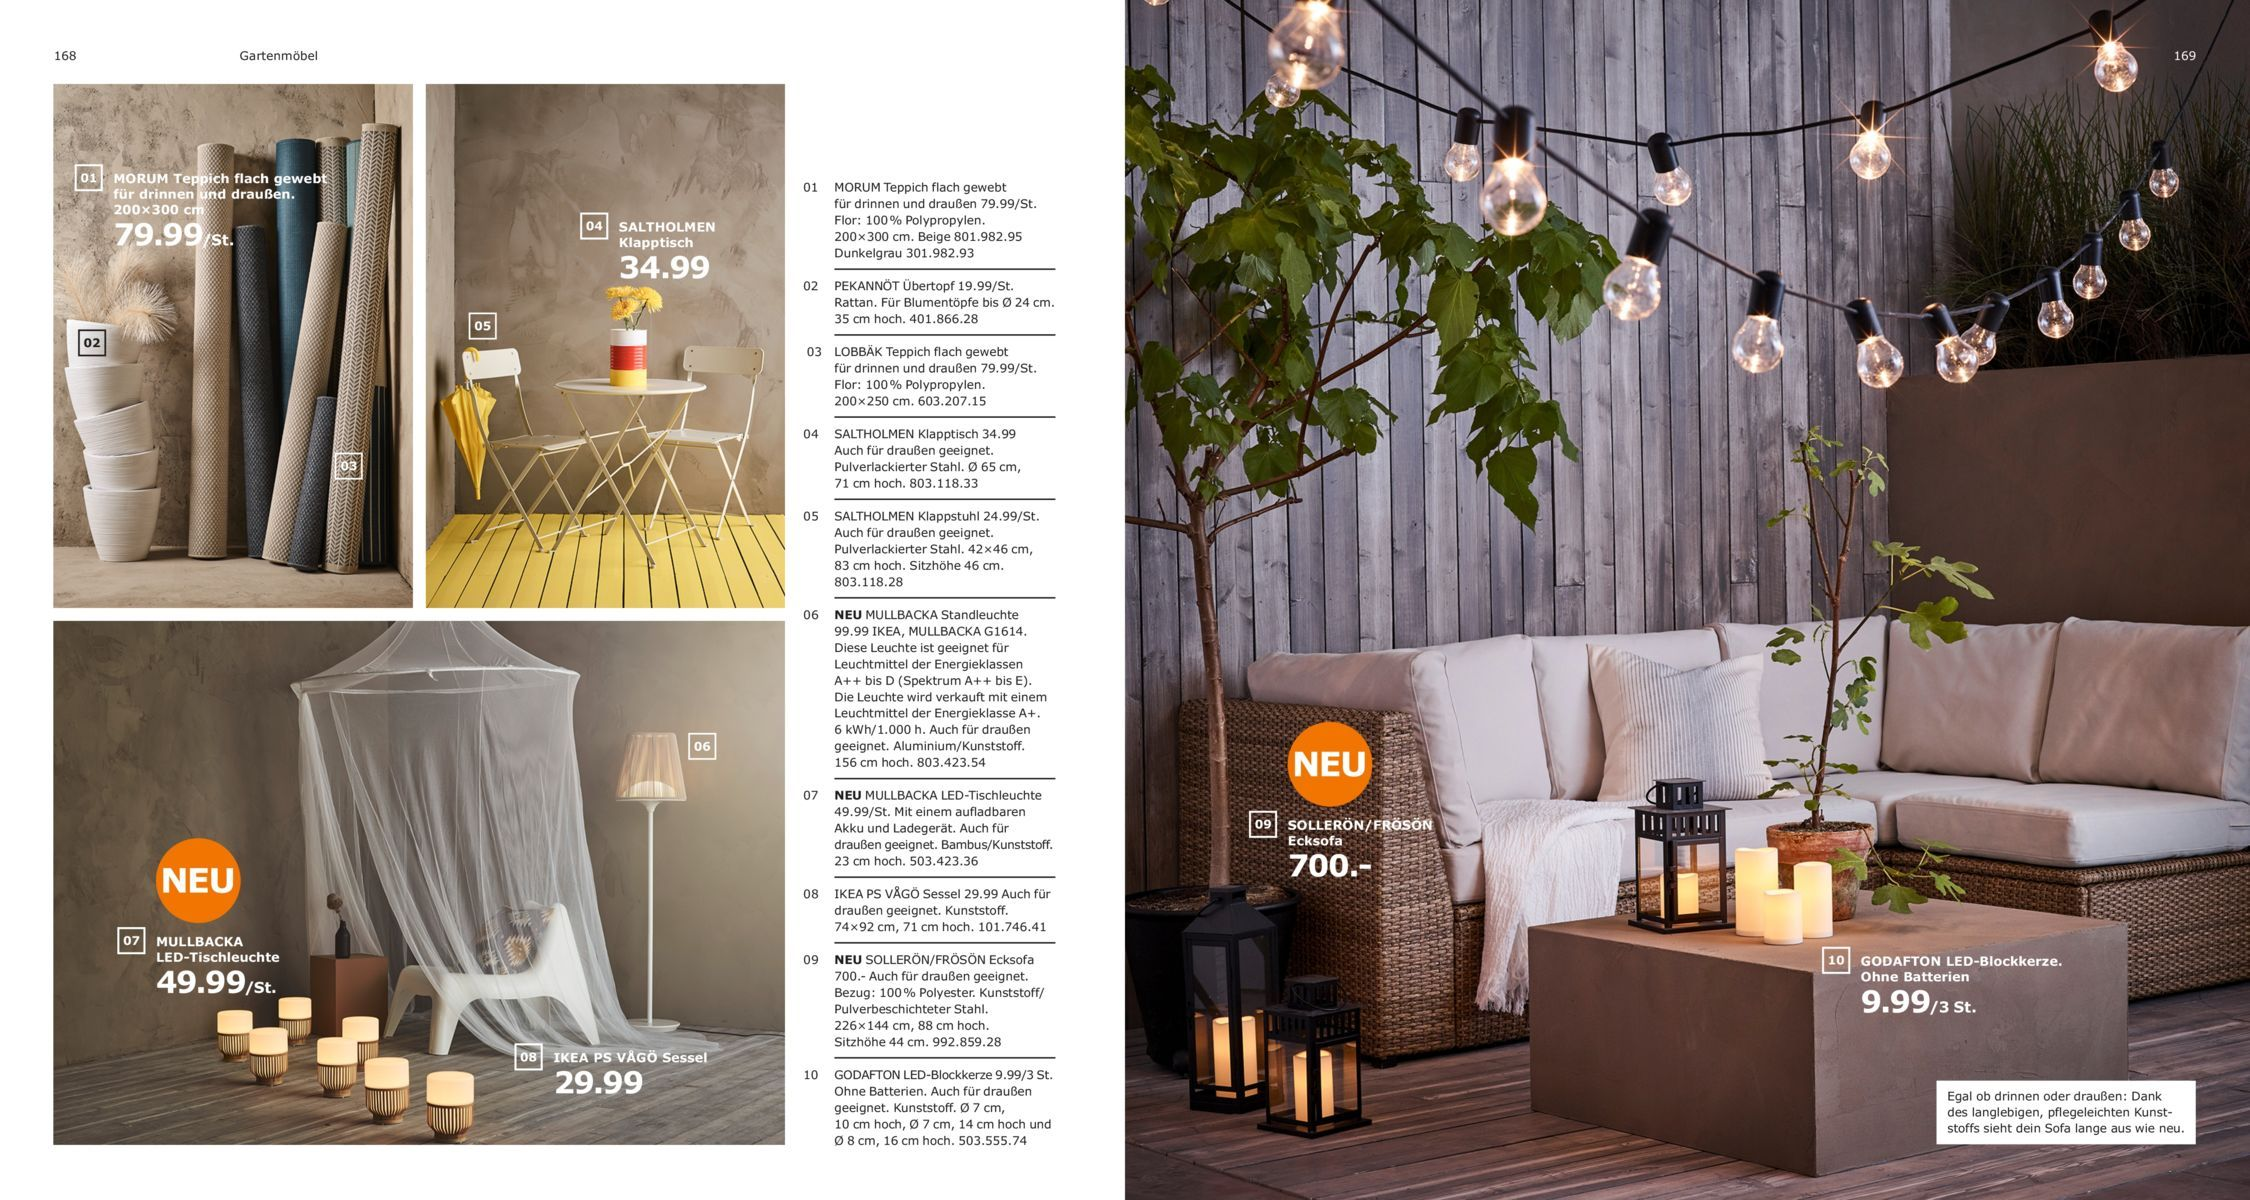 Küche - IKEA Katalog 2019 | Ikea, Draussenzimmer, Ikea küche